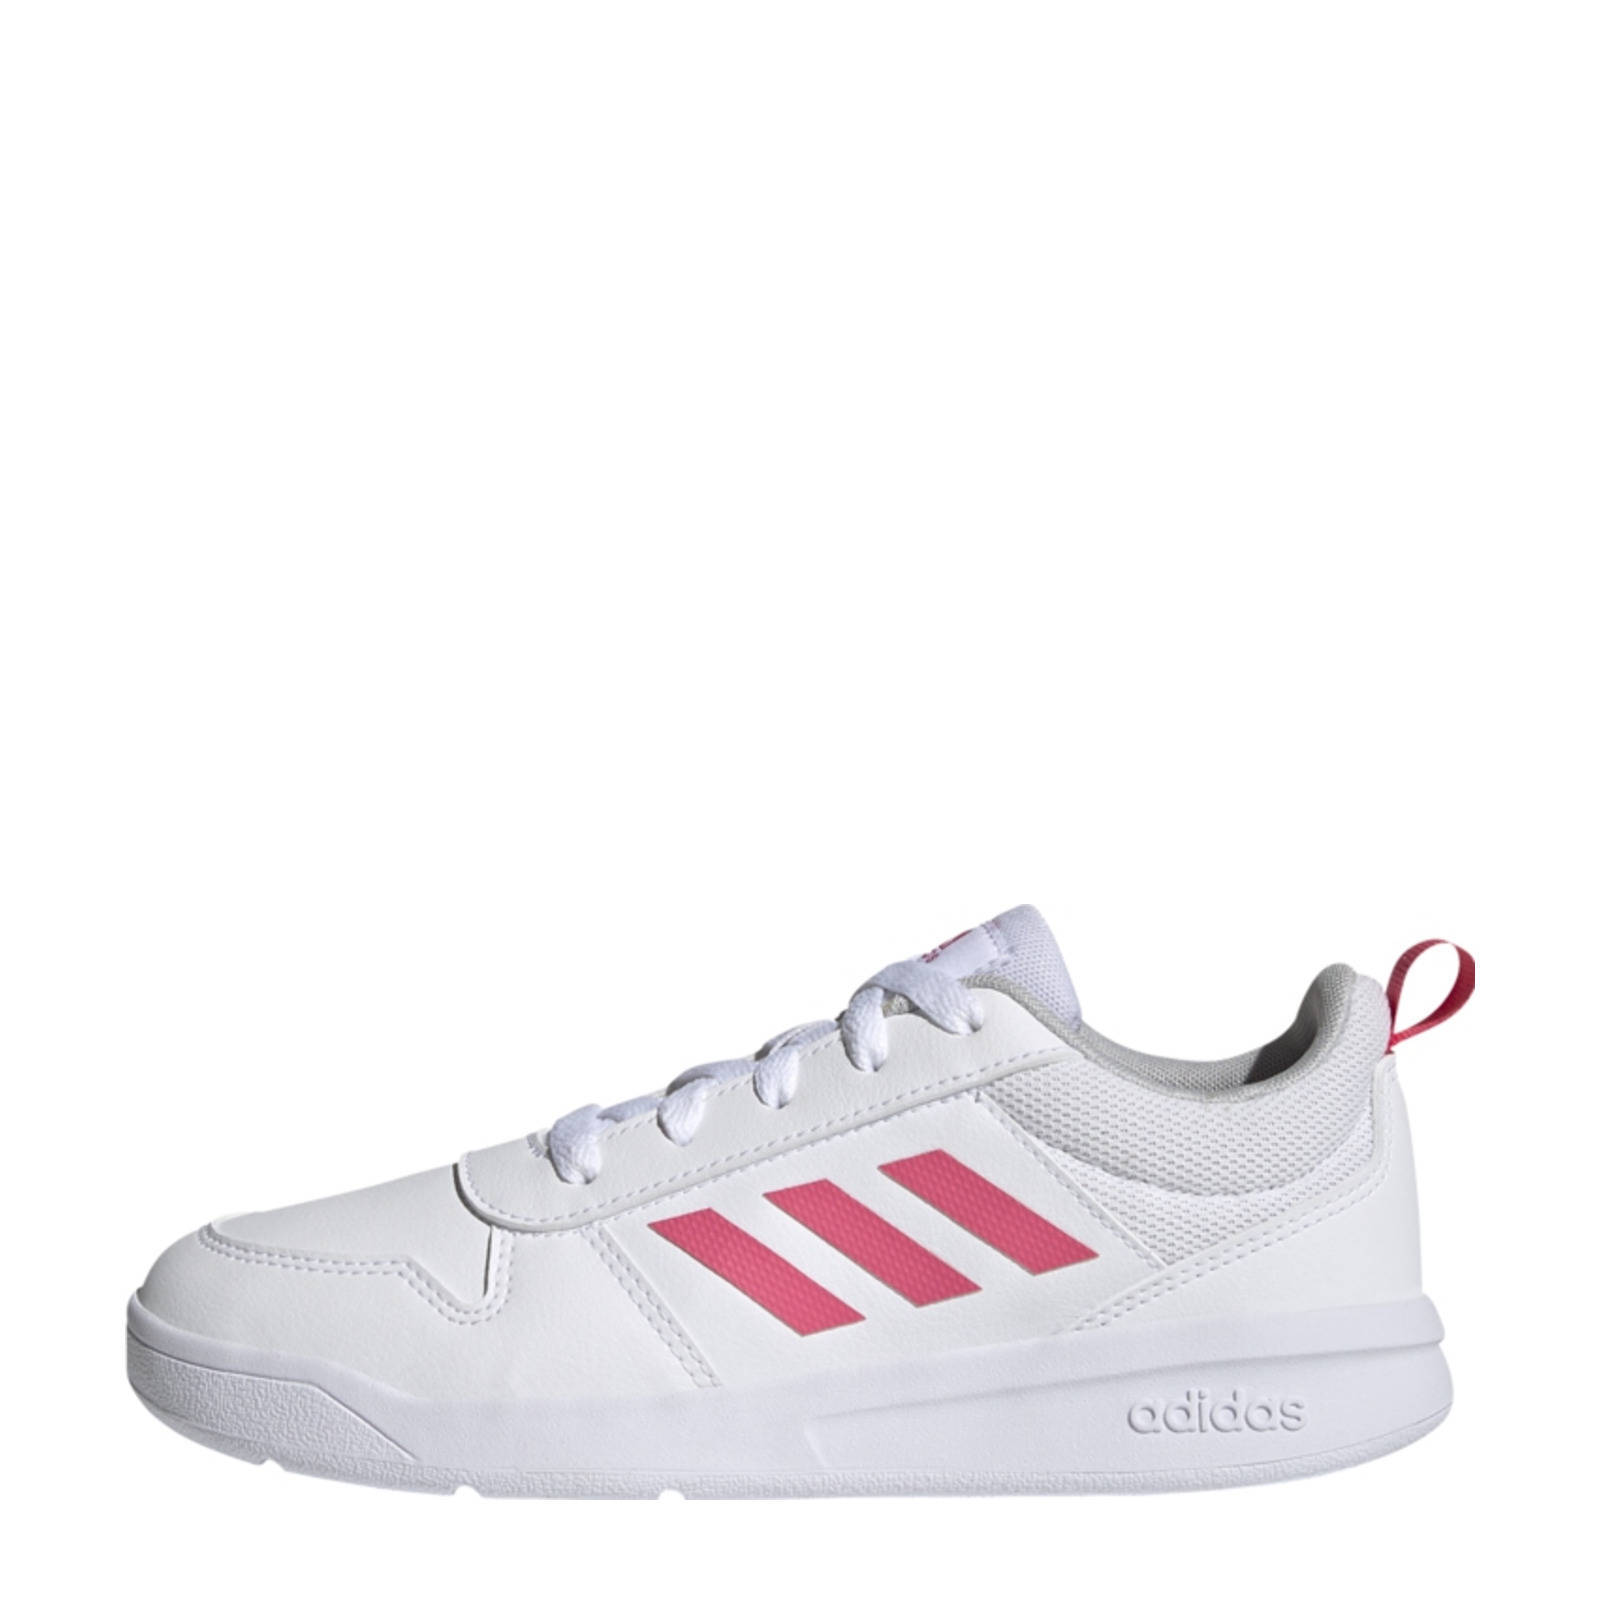 Adidas Performance Tensaur K hardloopschoenen wit/roze kids online kopen